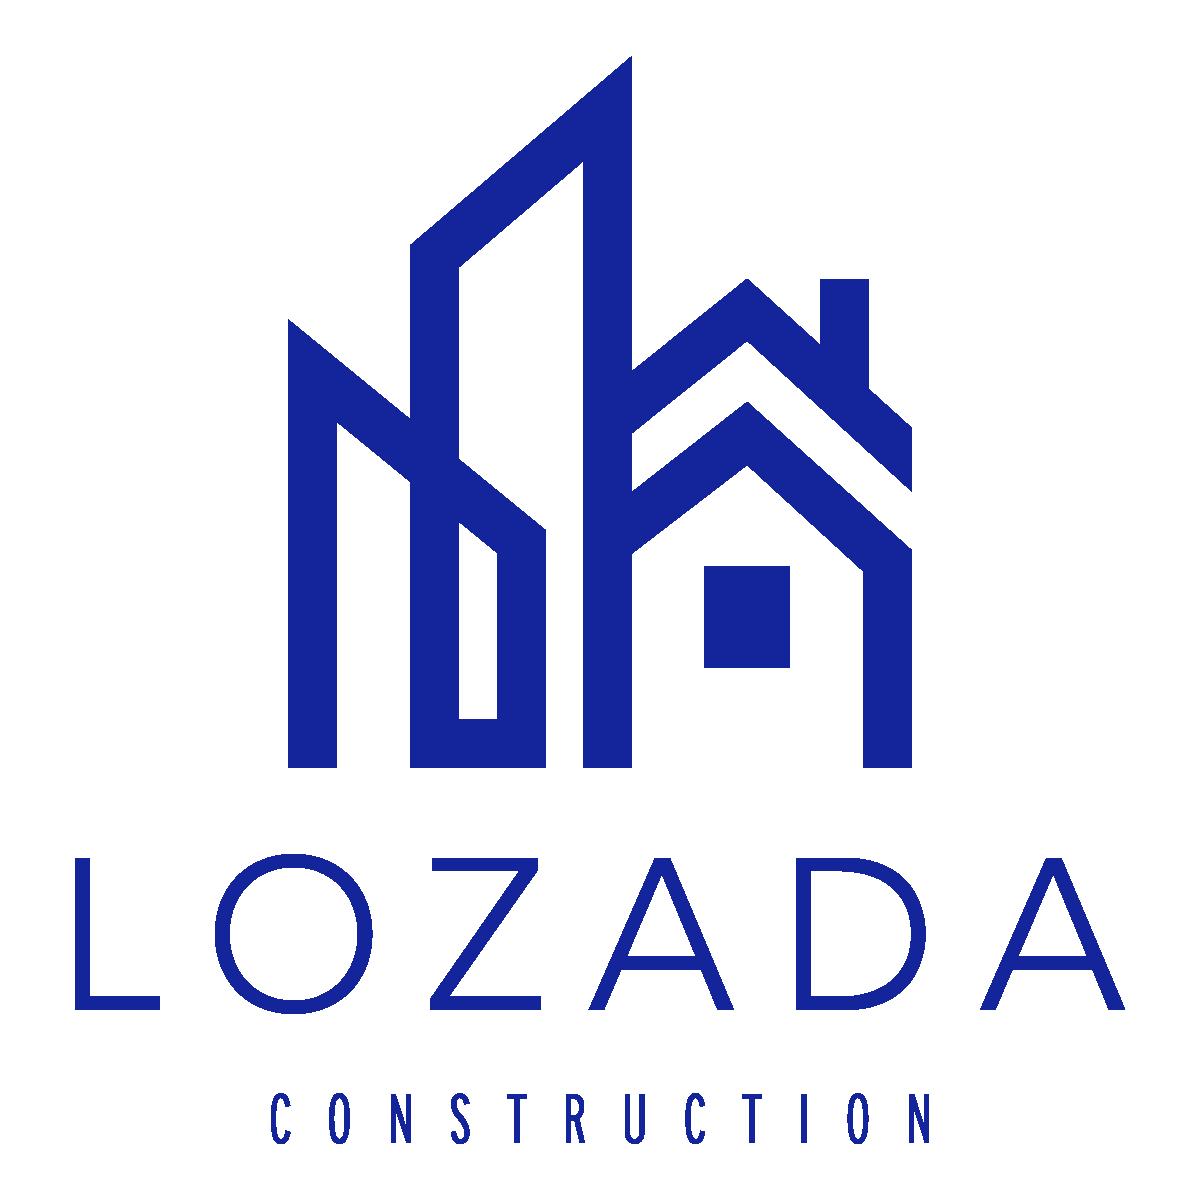 https://growthzonesitesprod.azureedge.net/wp-content/uploads/sites/1496/2020/03/LozadaConstruction-Logo2.png